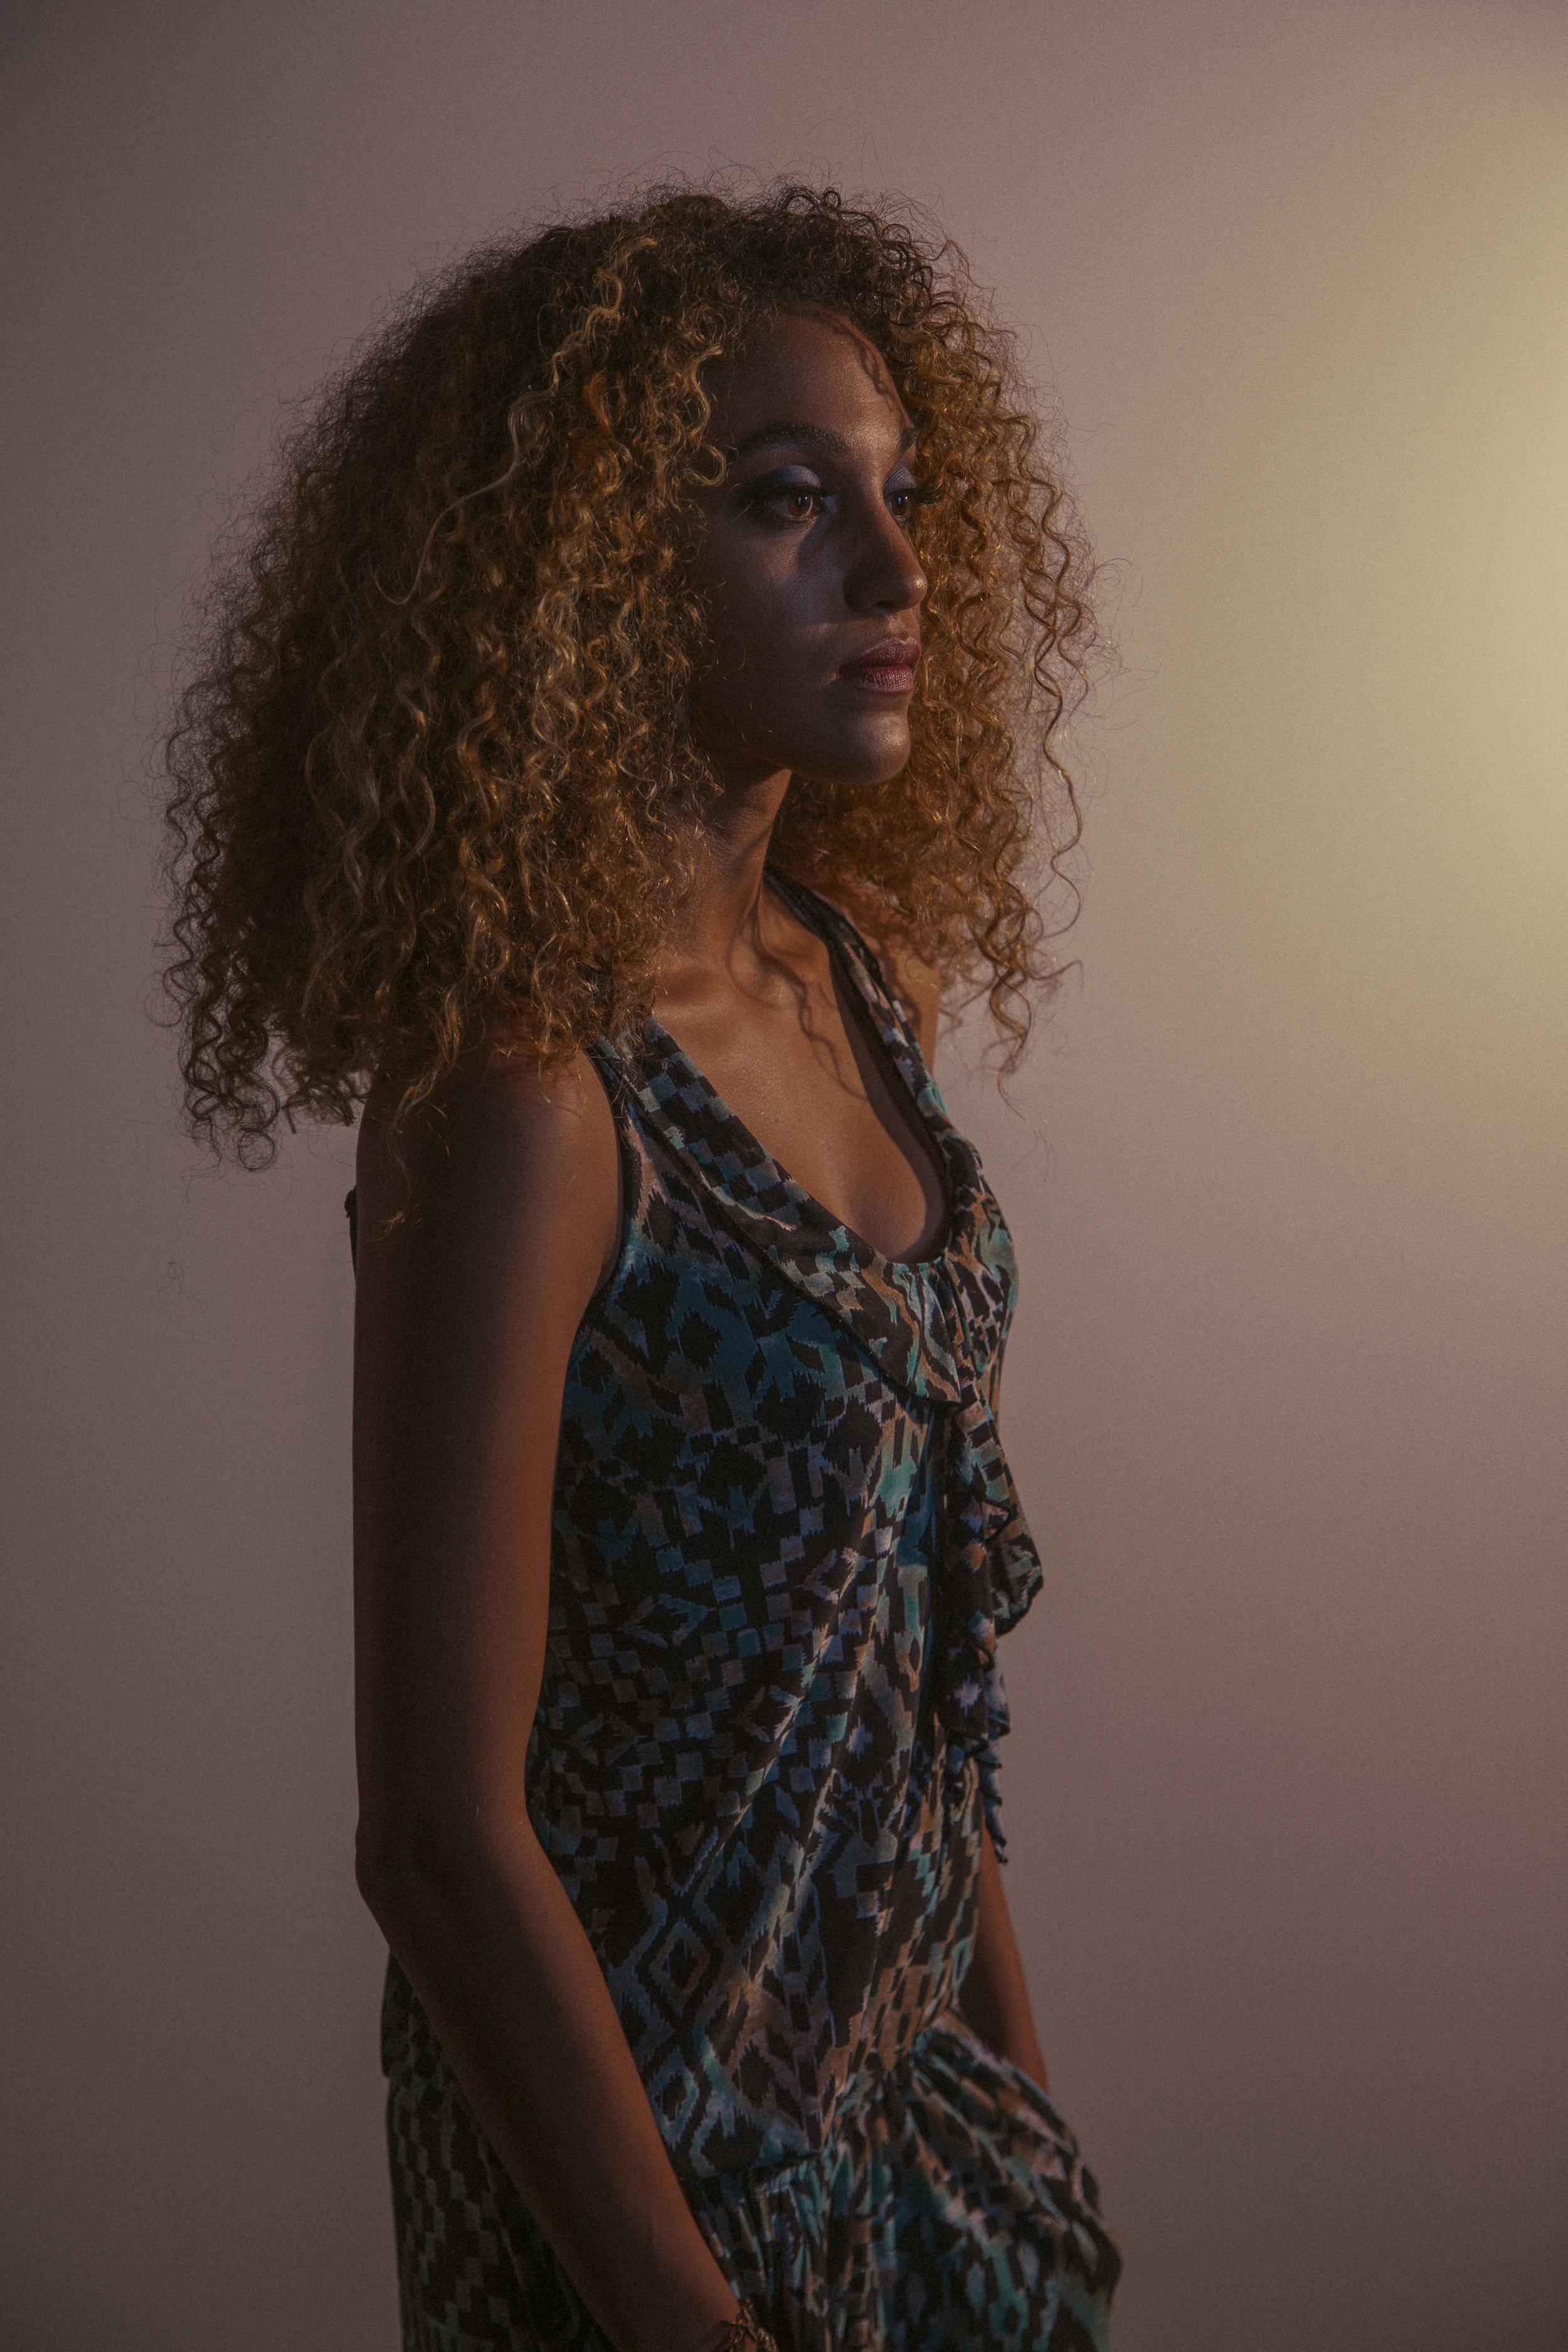 Danielle-70-Edit.jpg